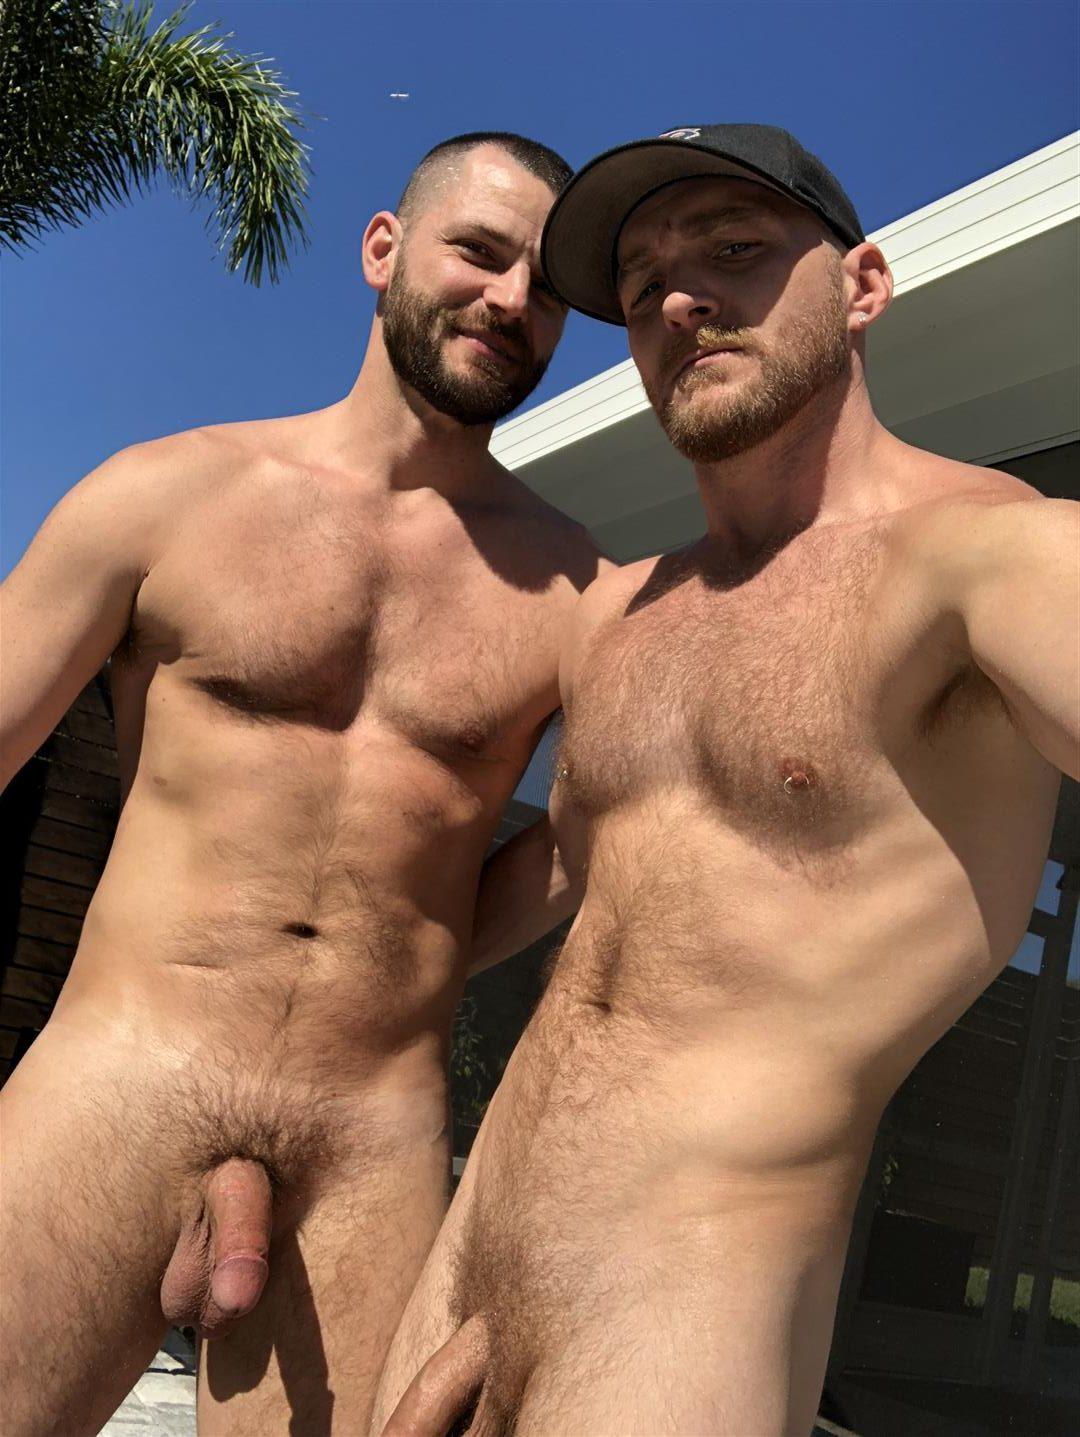 Deviant-Otter-Jake-Naked-Hairy-Guys-Amateur-Bareback-Sex-19-e1522800413865 Outdoor Bareback Flip Fucking With The Deviant Otter